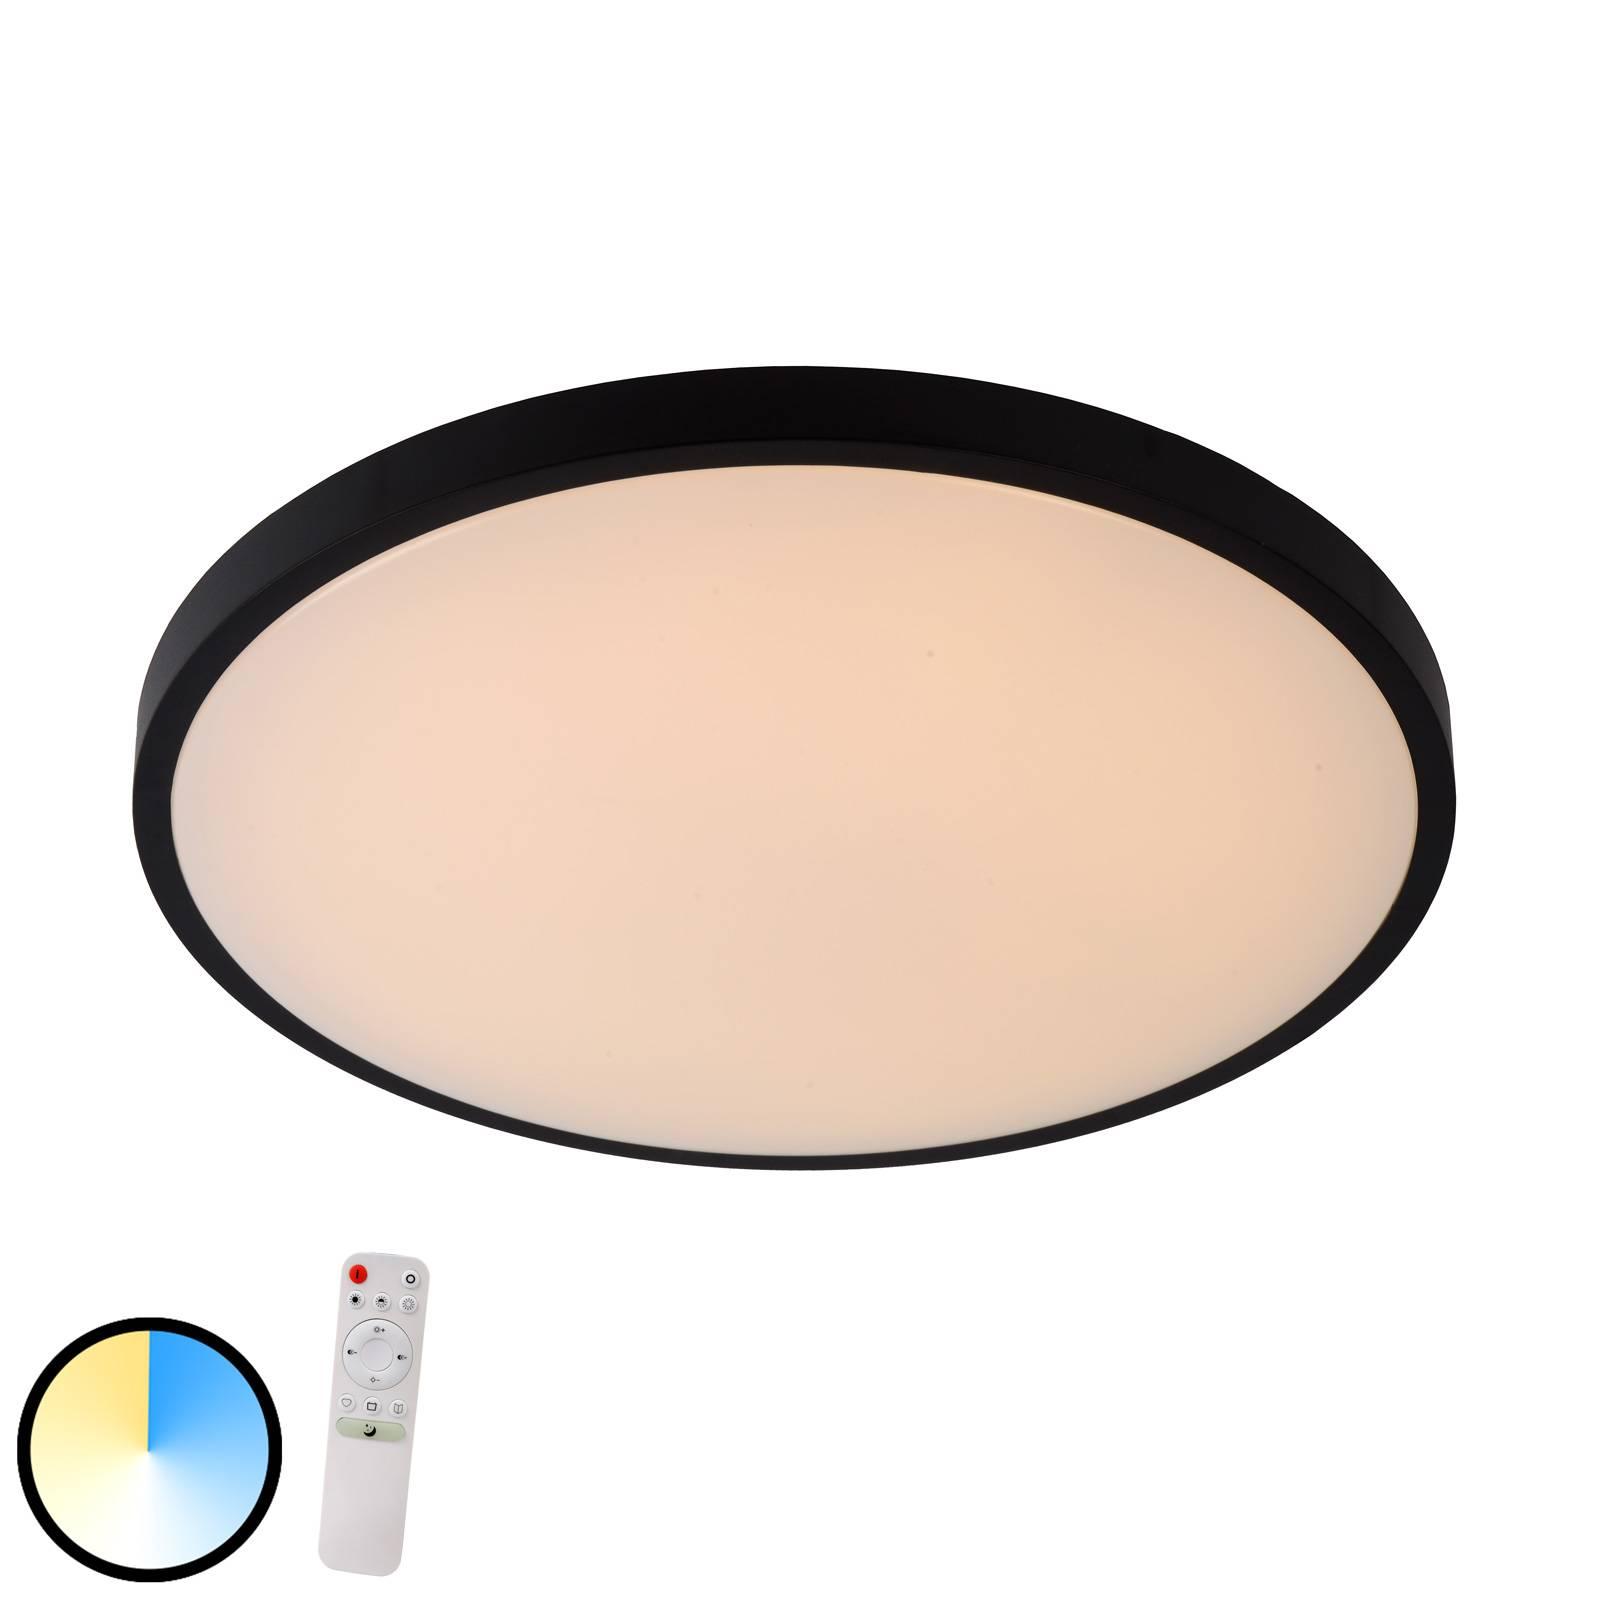 Lampa sufitowa LED Polaris dim to warm Ø 45,7 cm